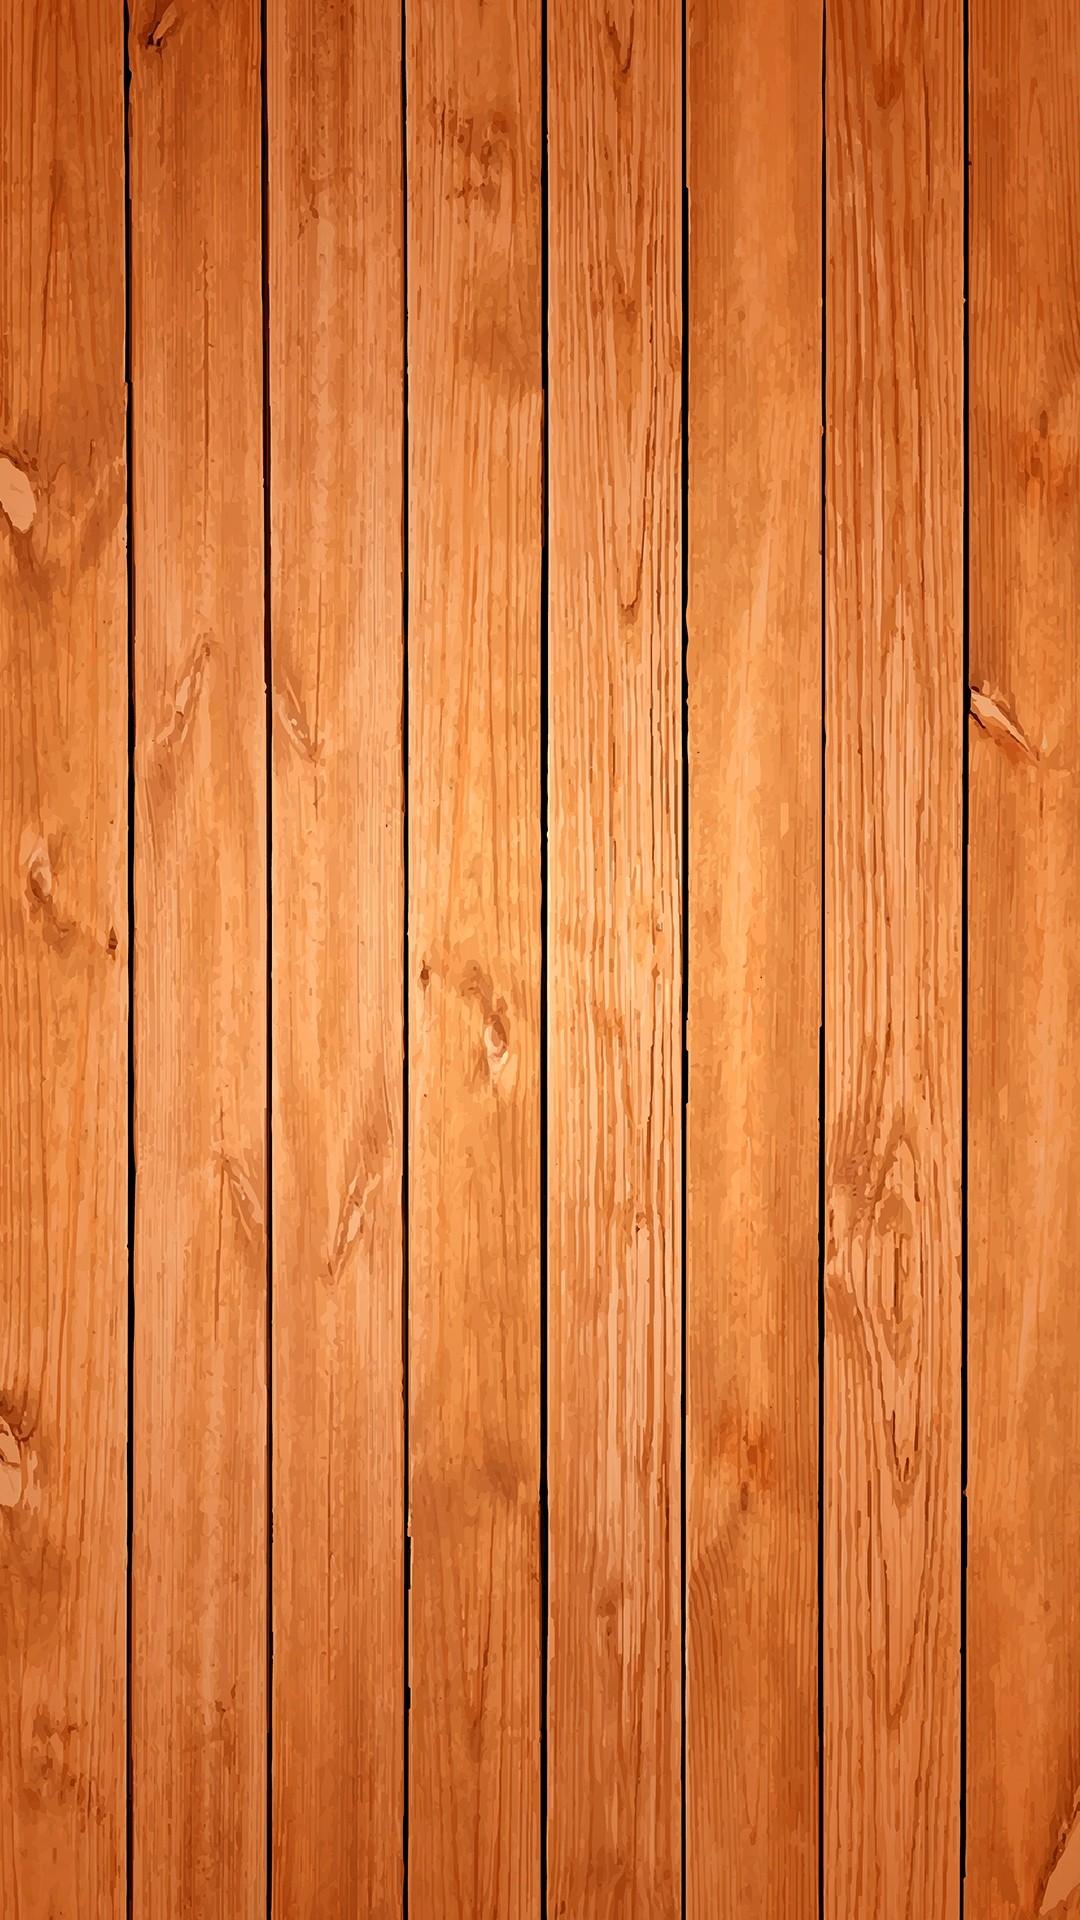 Wood iphone 5s